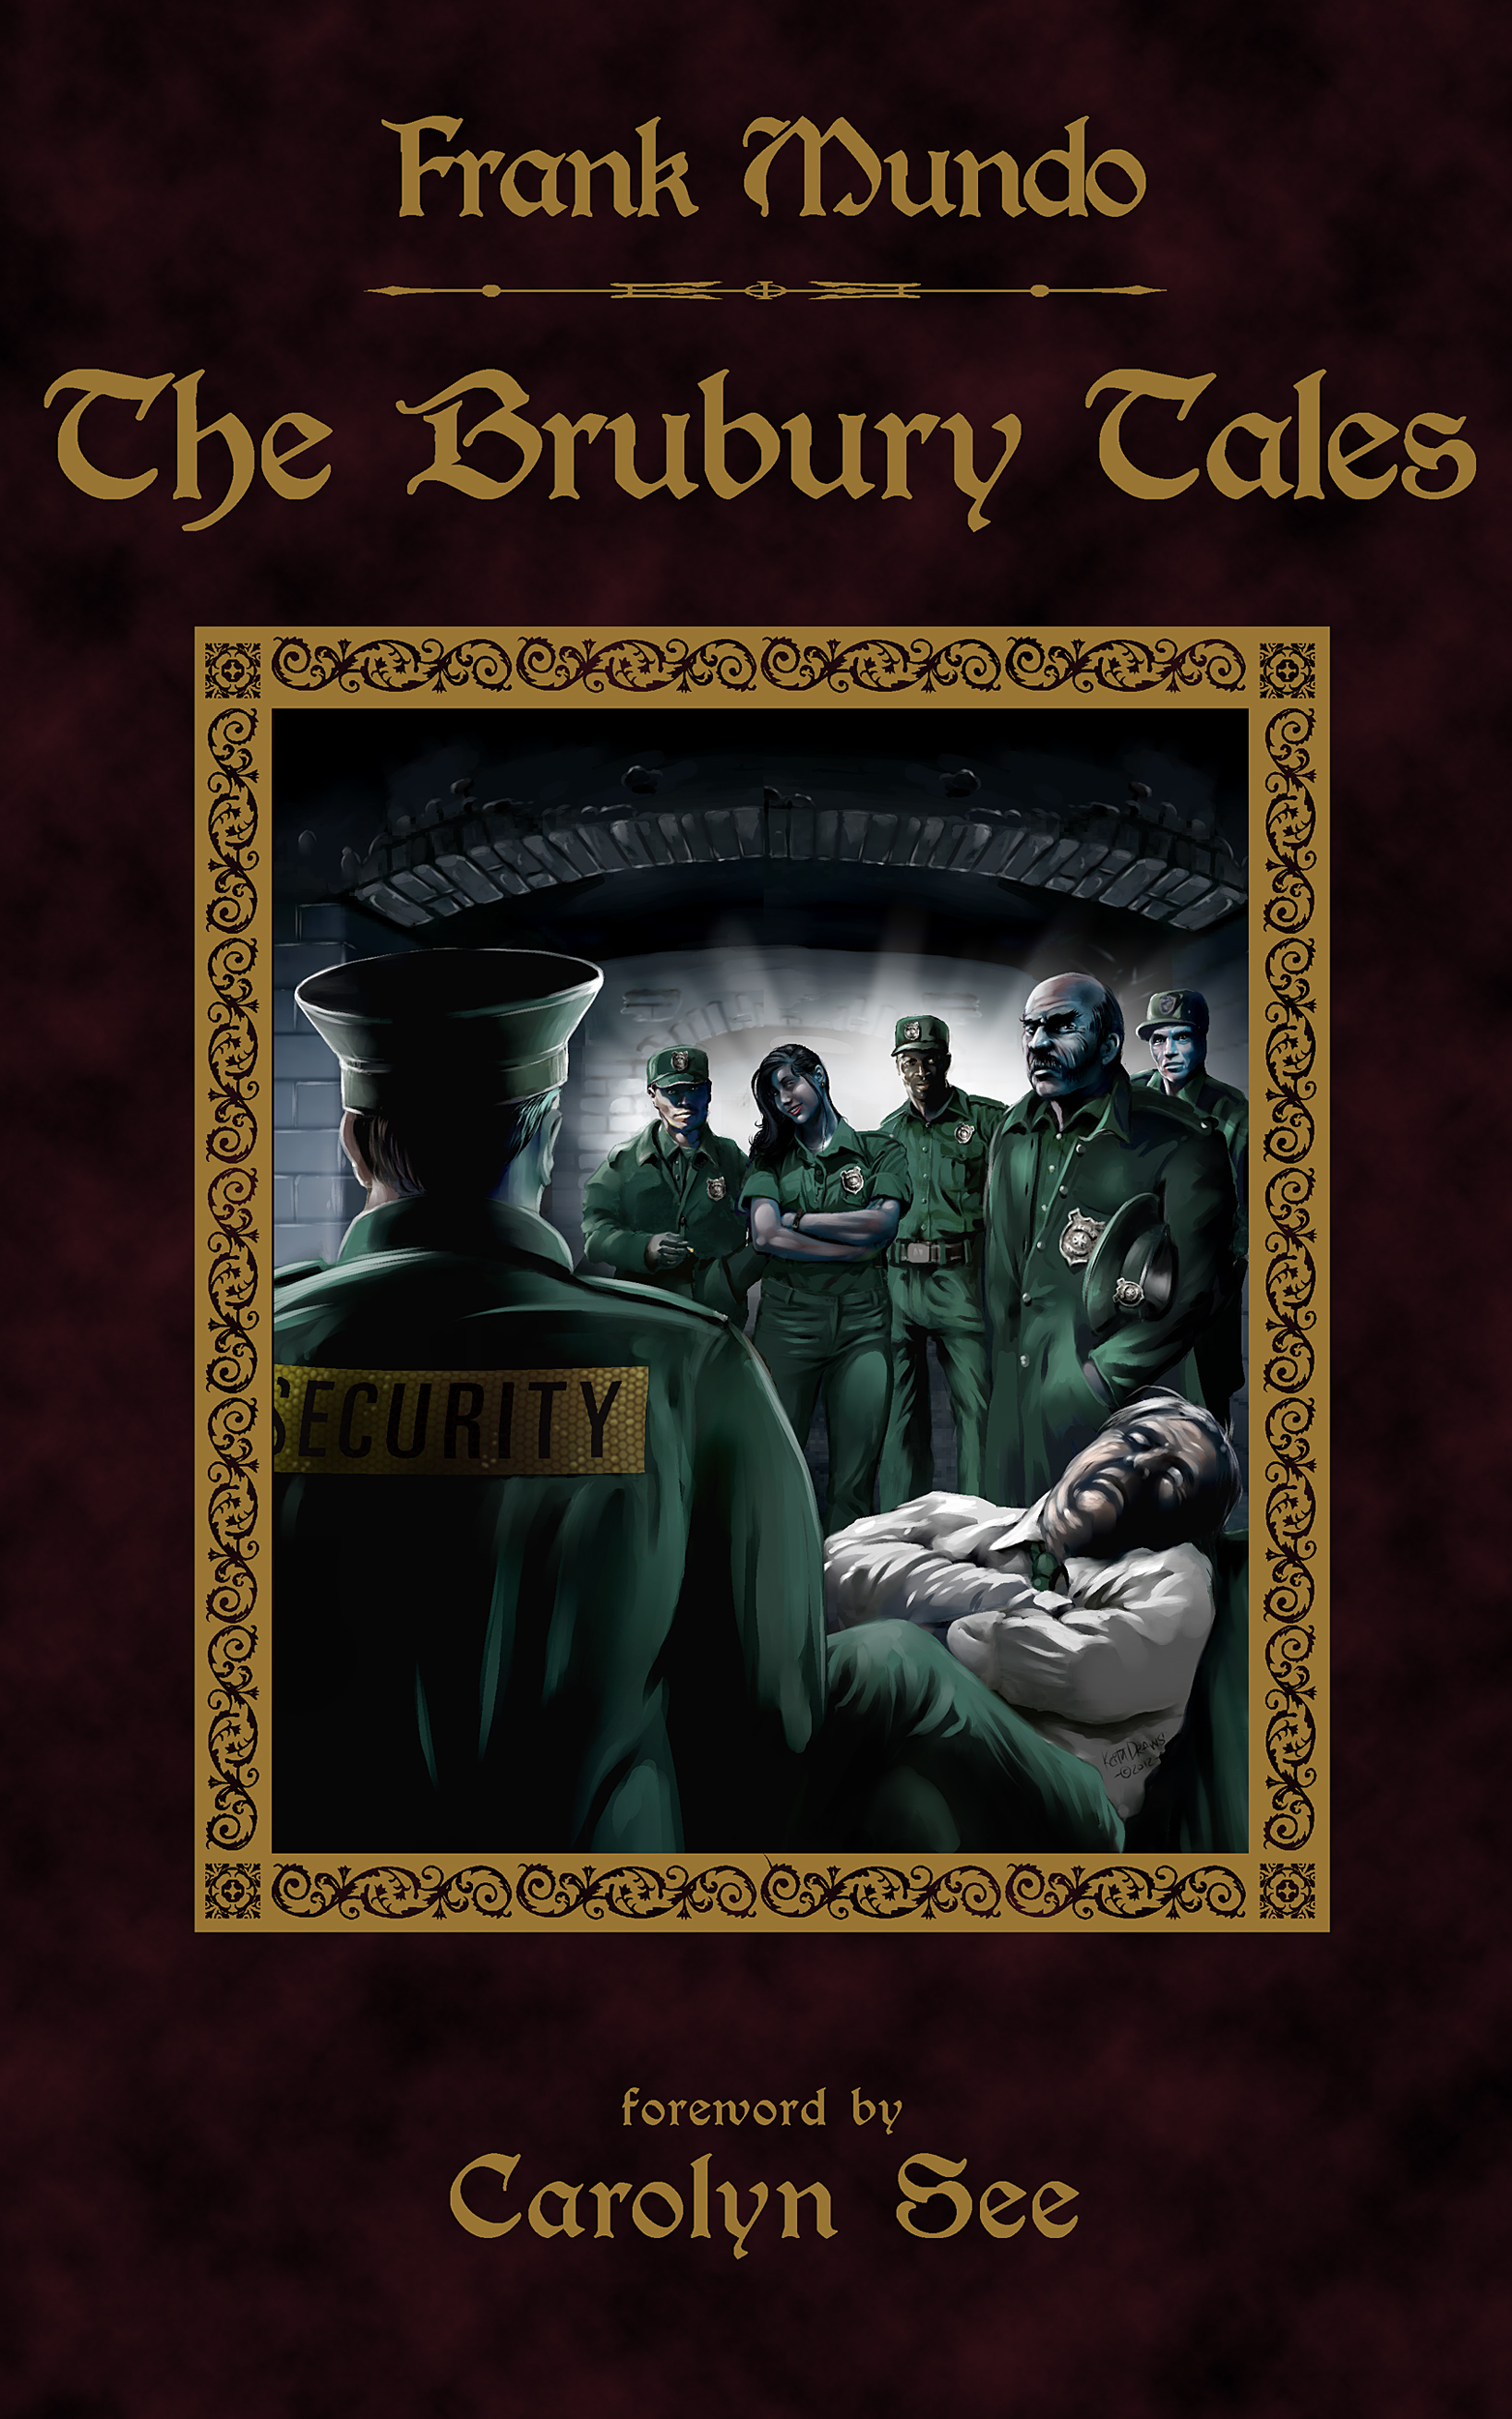 The Brubury Tales